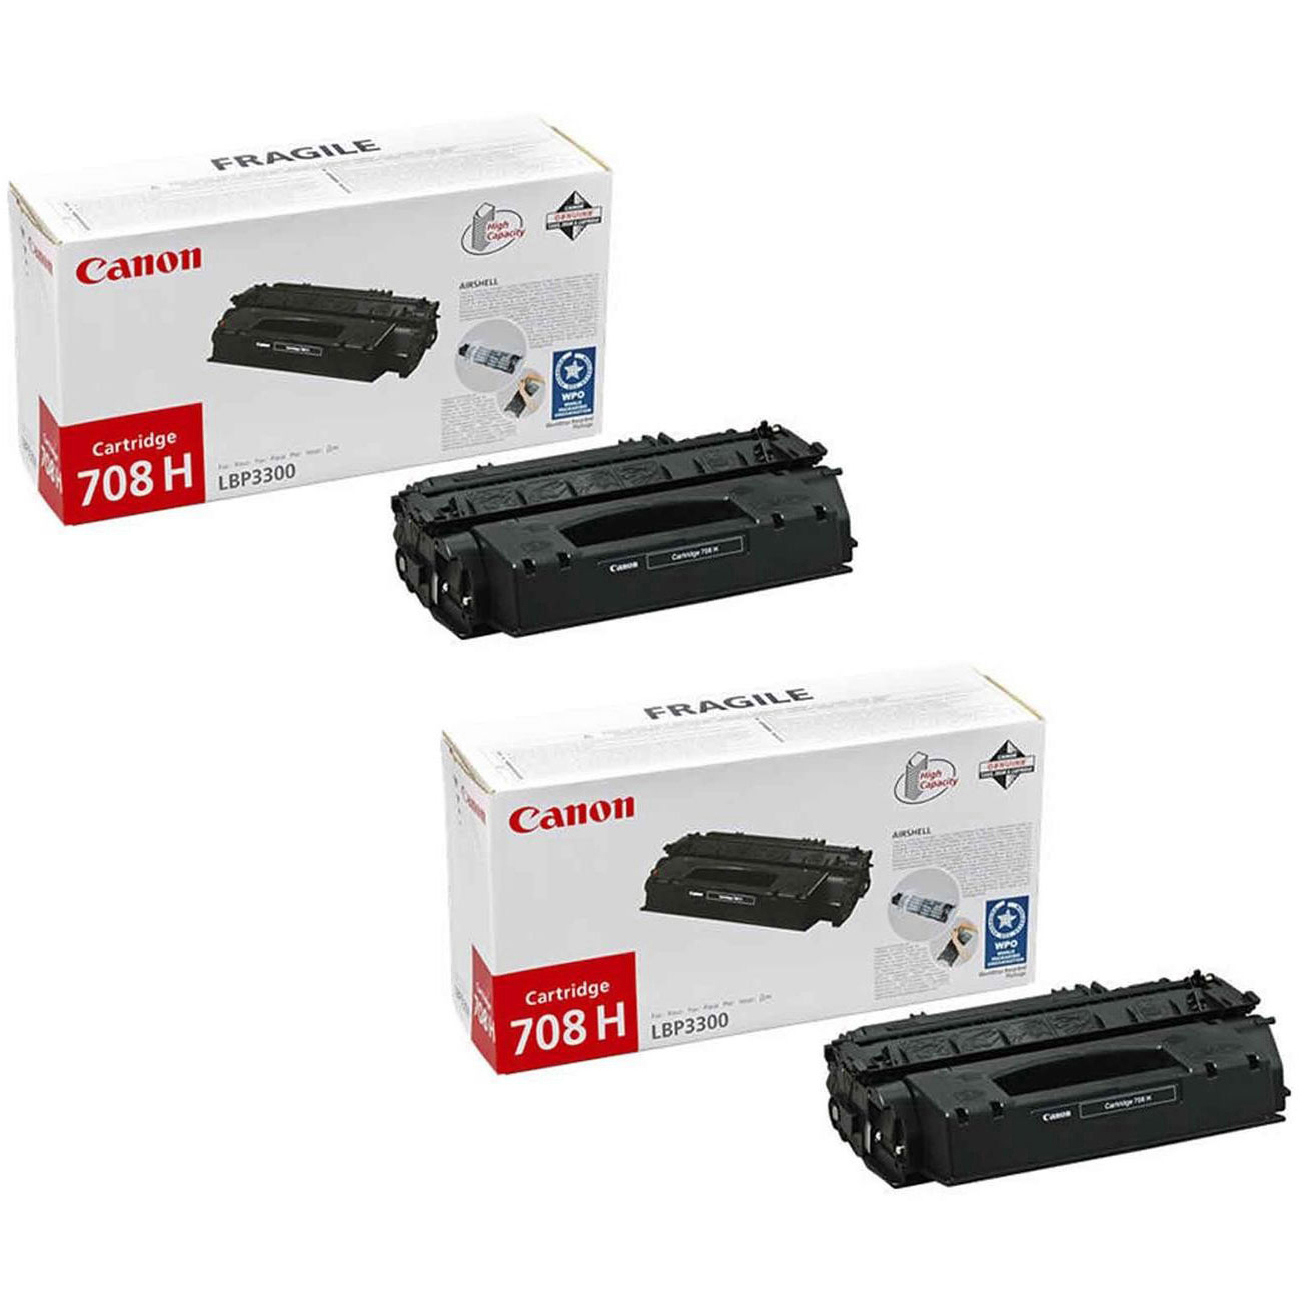 Original Canon 708H Black Twin Pack High Capacity Toner Cartridges (0917B002AA)